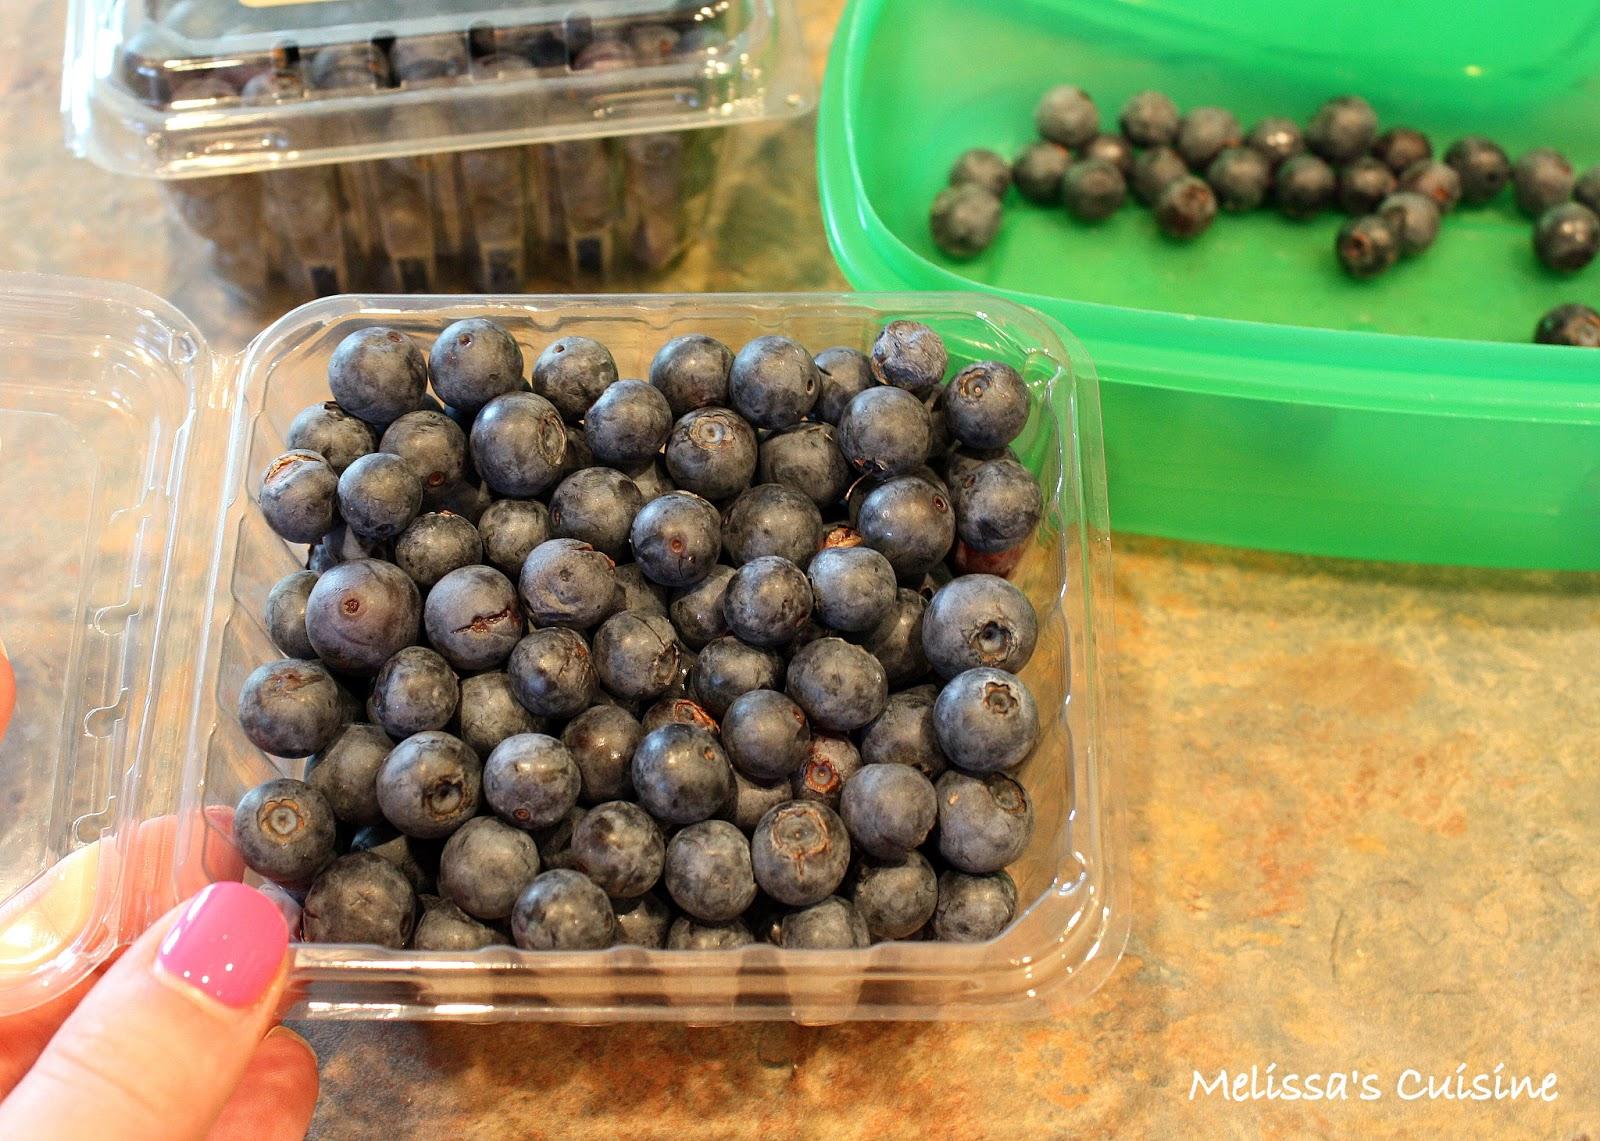 Melissa's Cuisine: Blueberries: Tips and Tricks